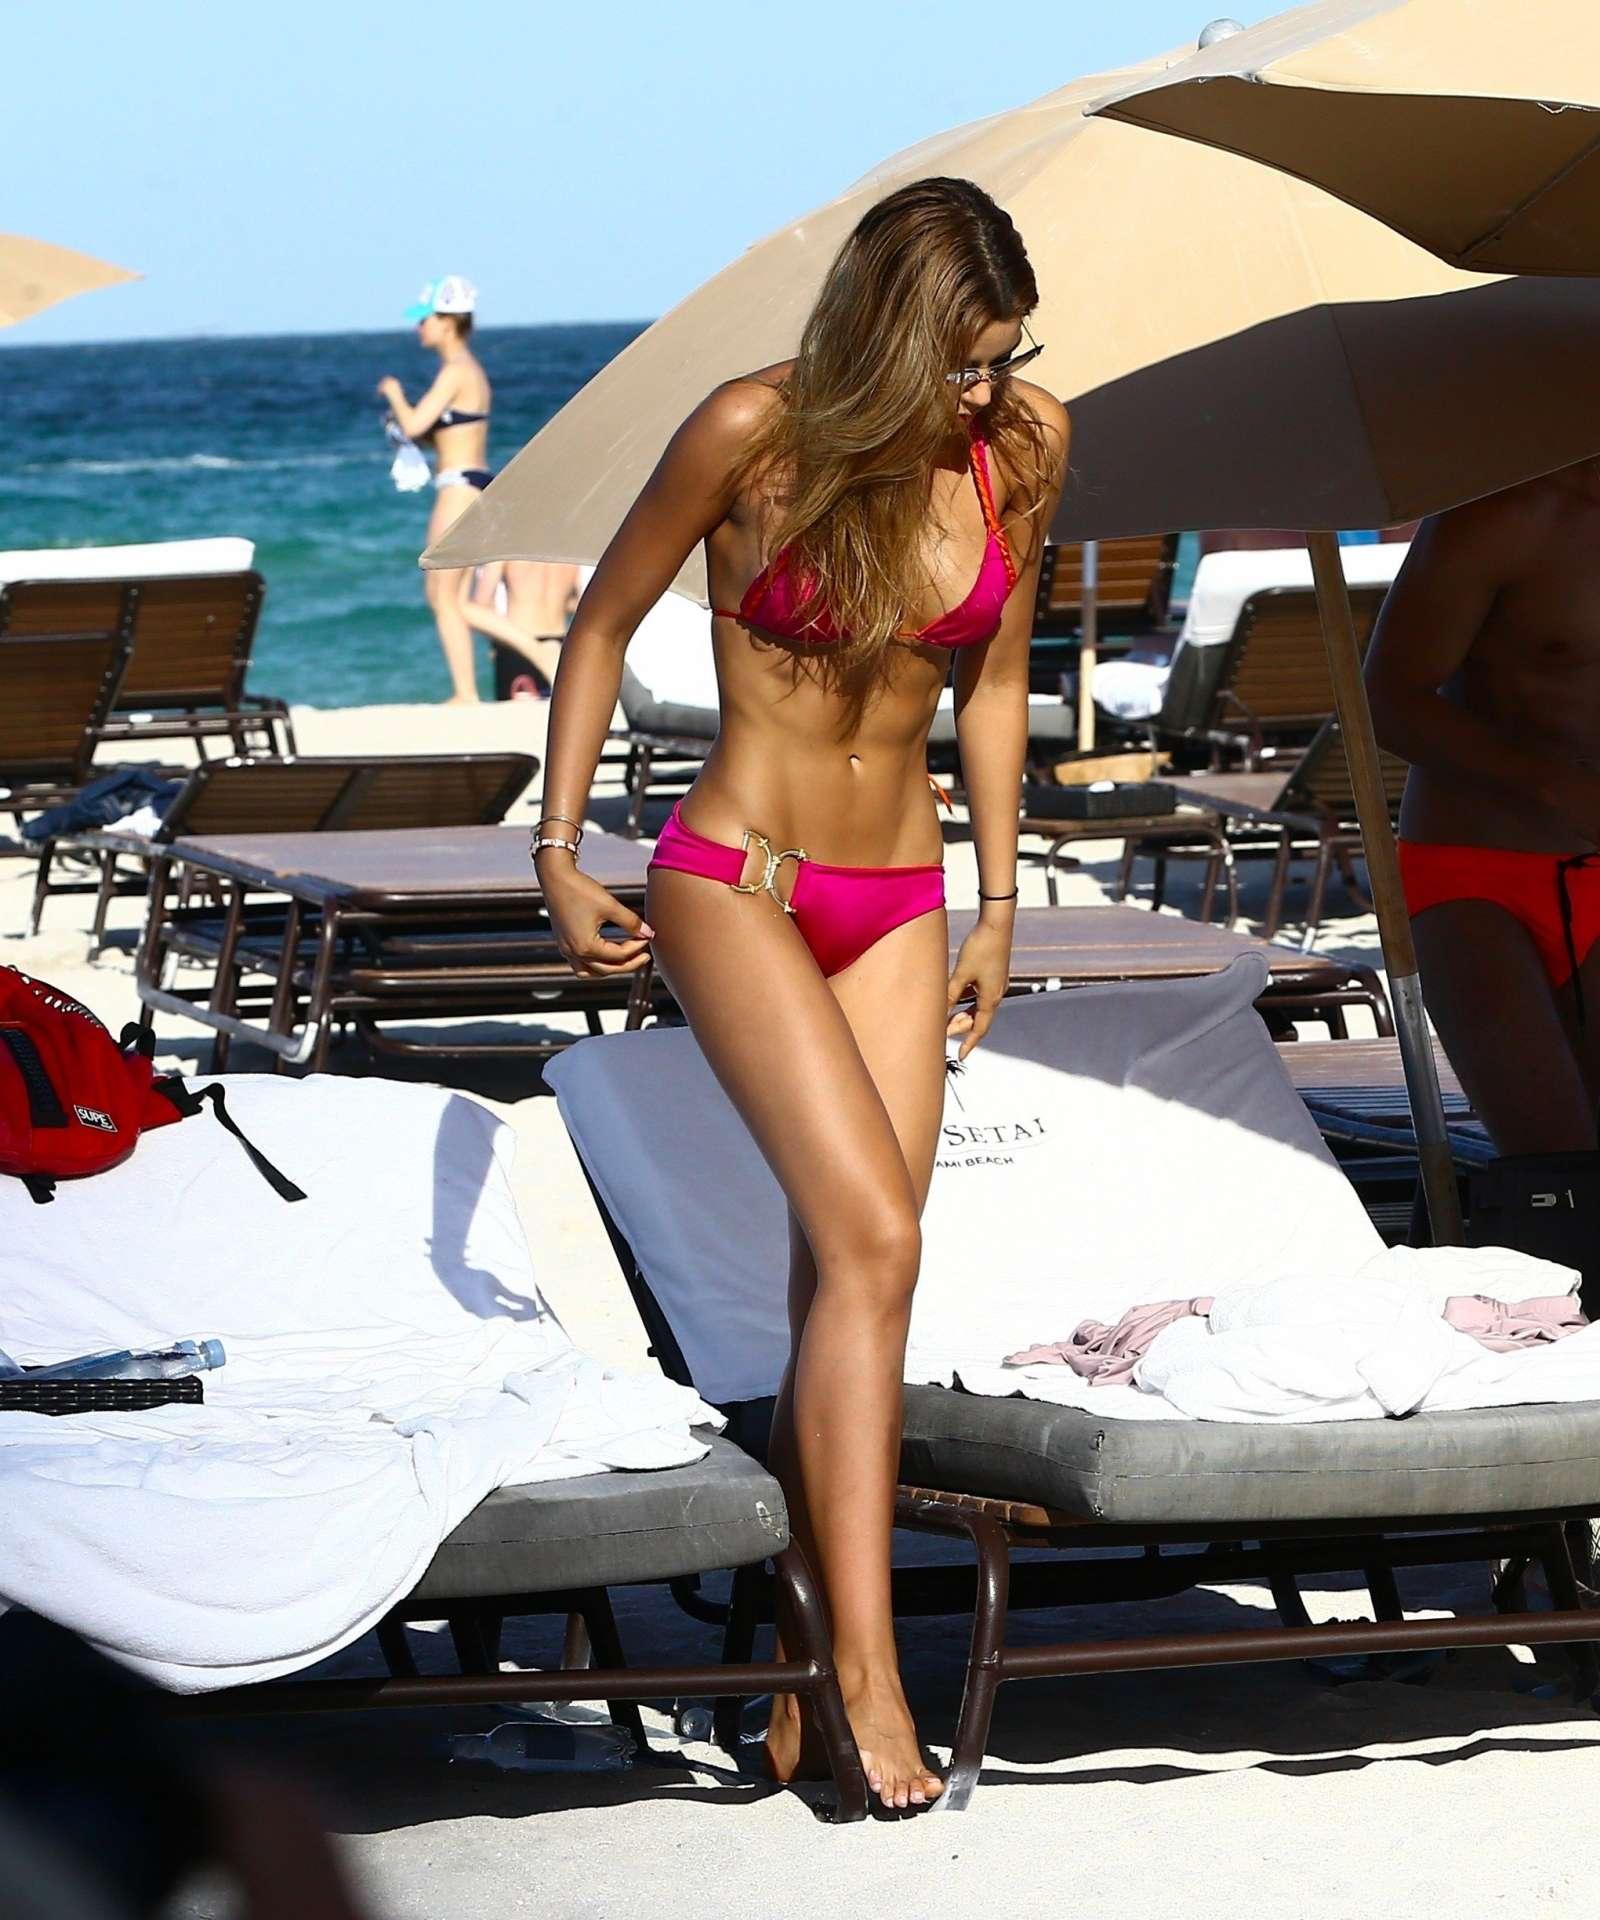 Bikini Ariadna Gutierrez nudes (44 foto and video), Ass, Hot, Feet, braless 2006